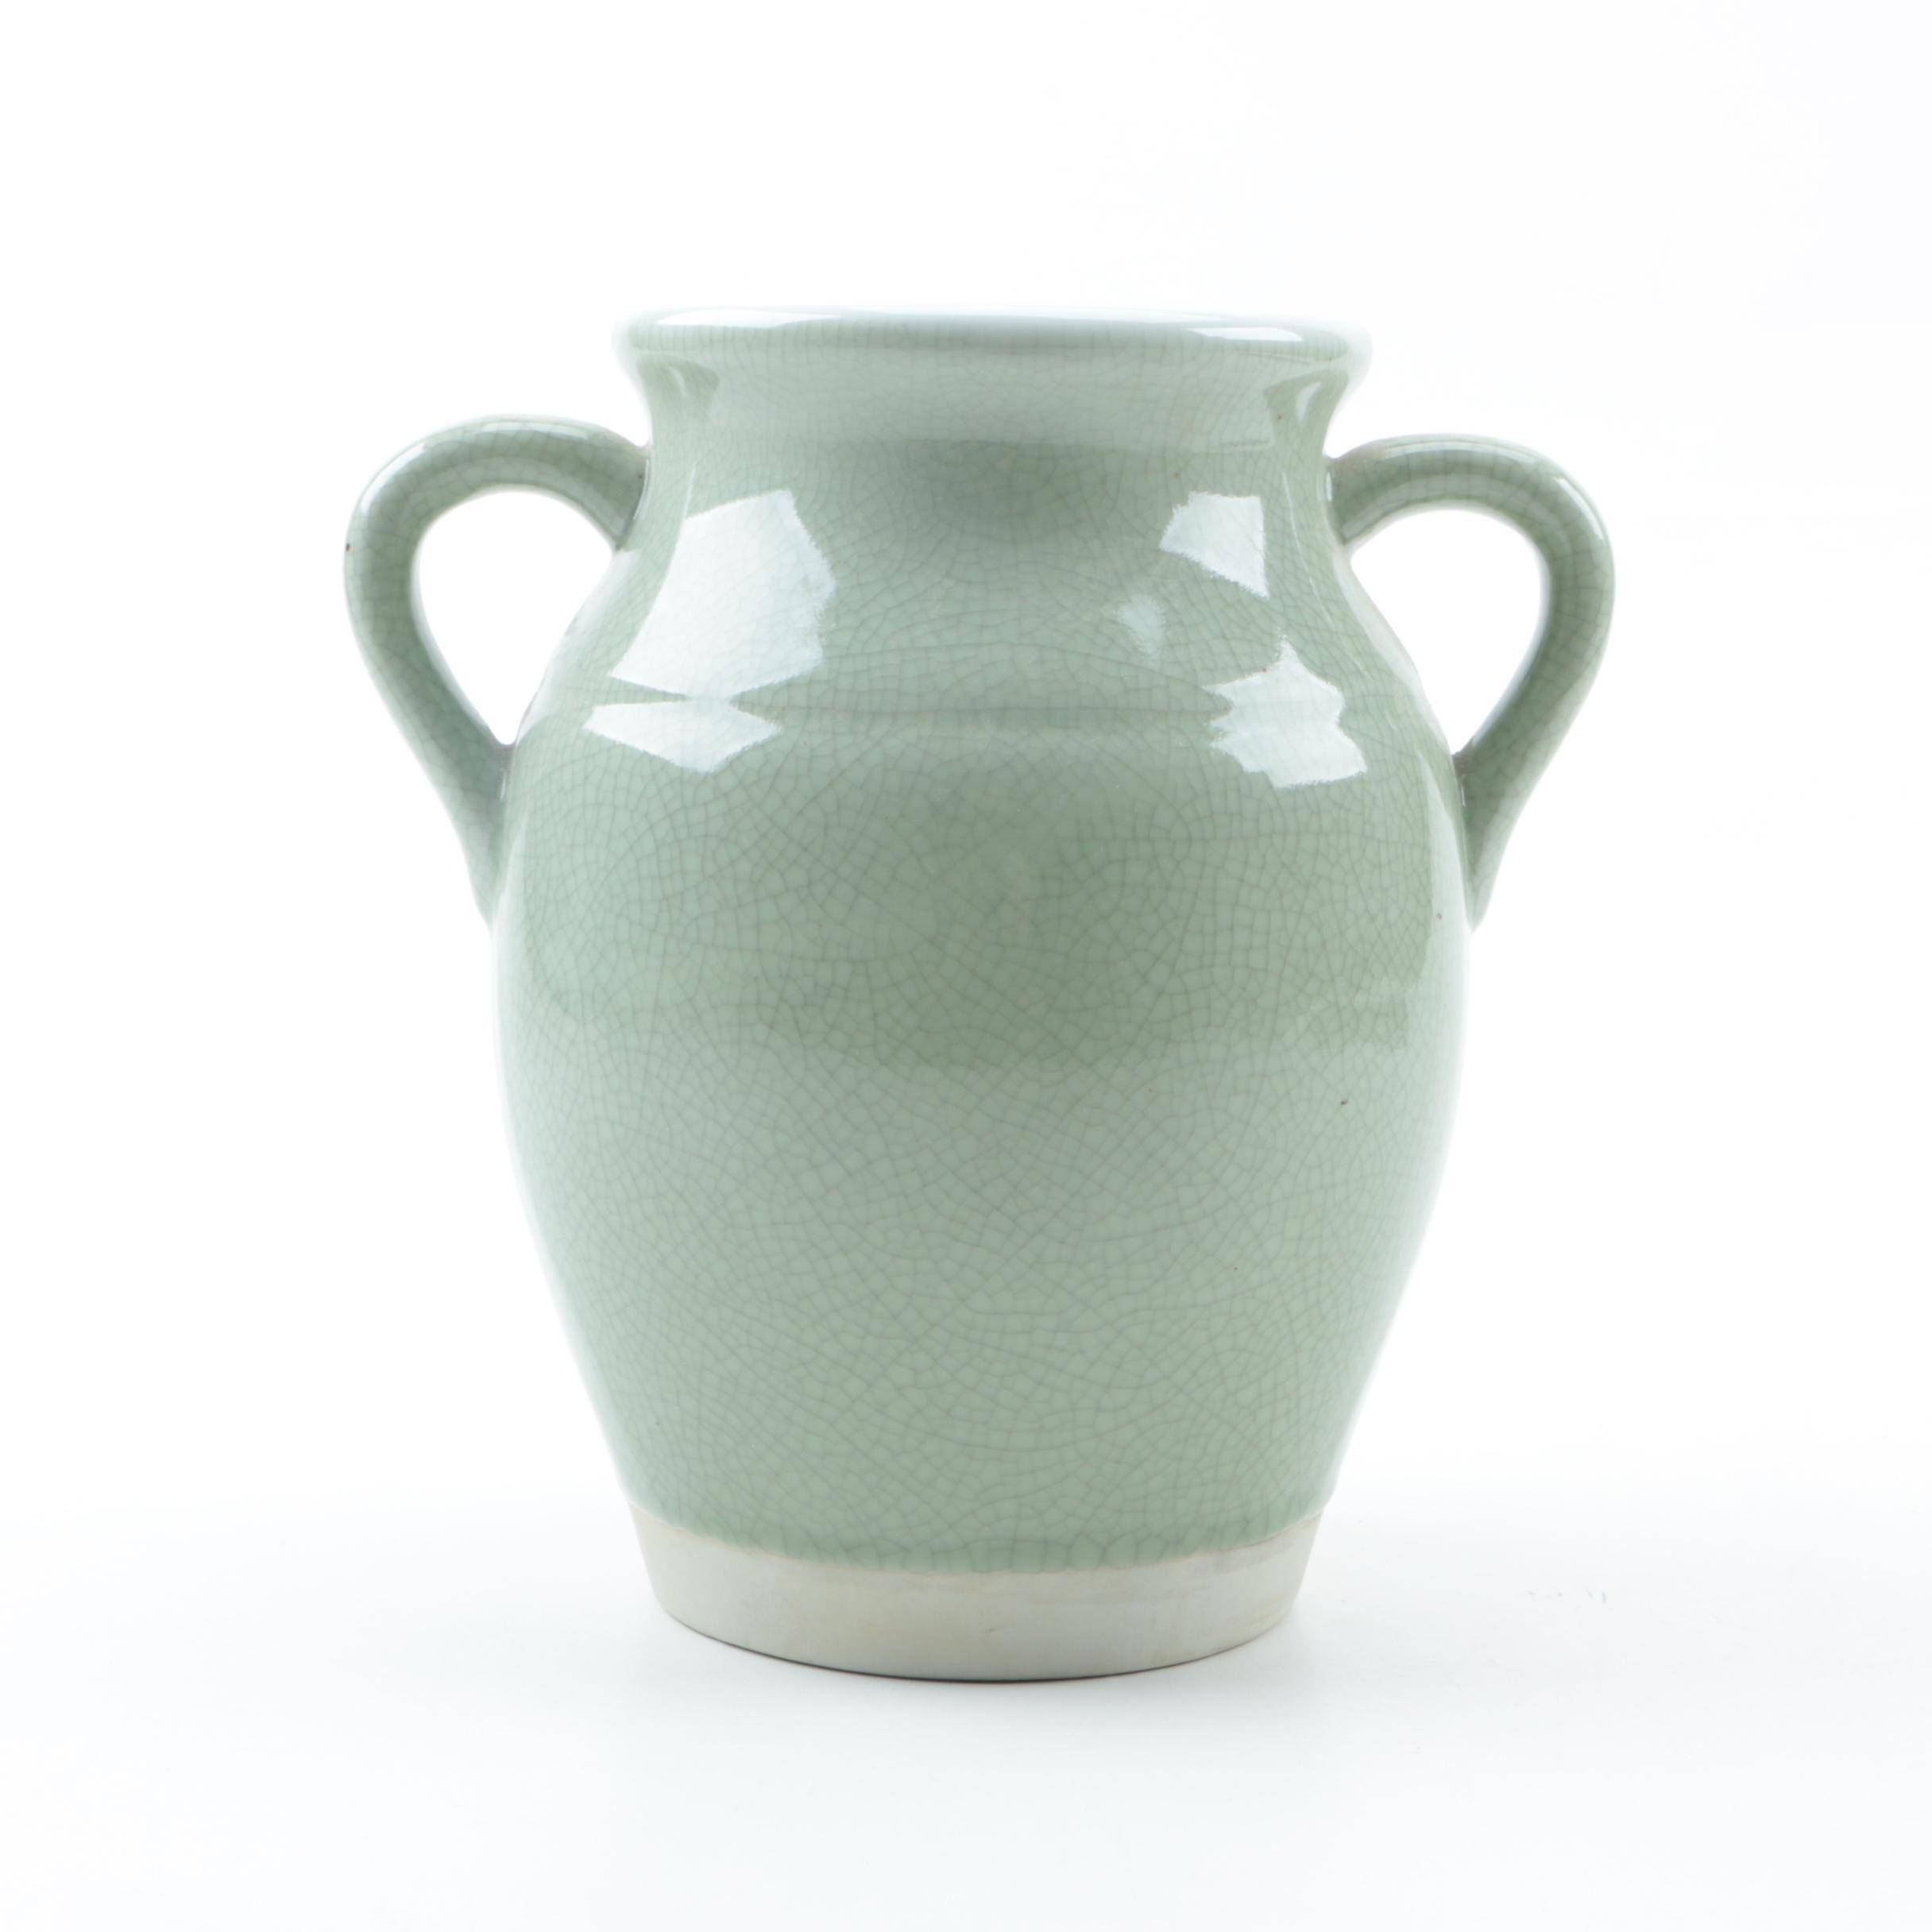 Celadon Vase Featuring a Crackle Glaze